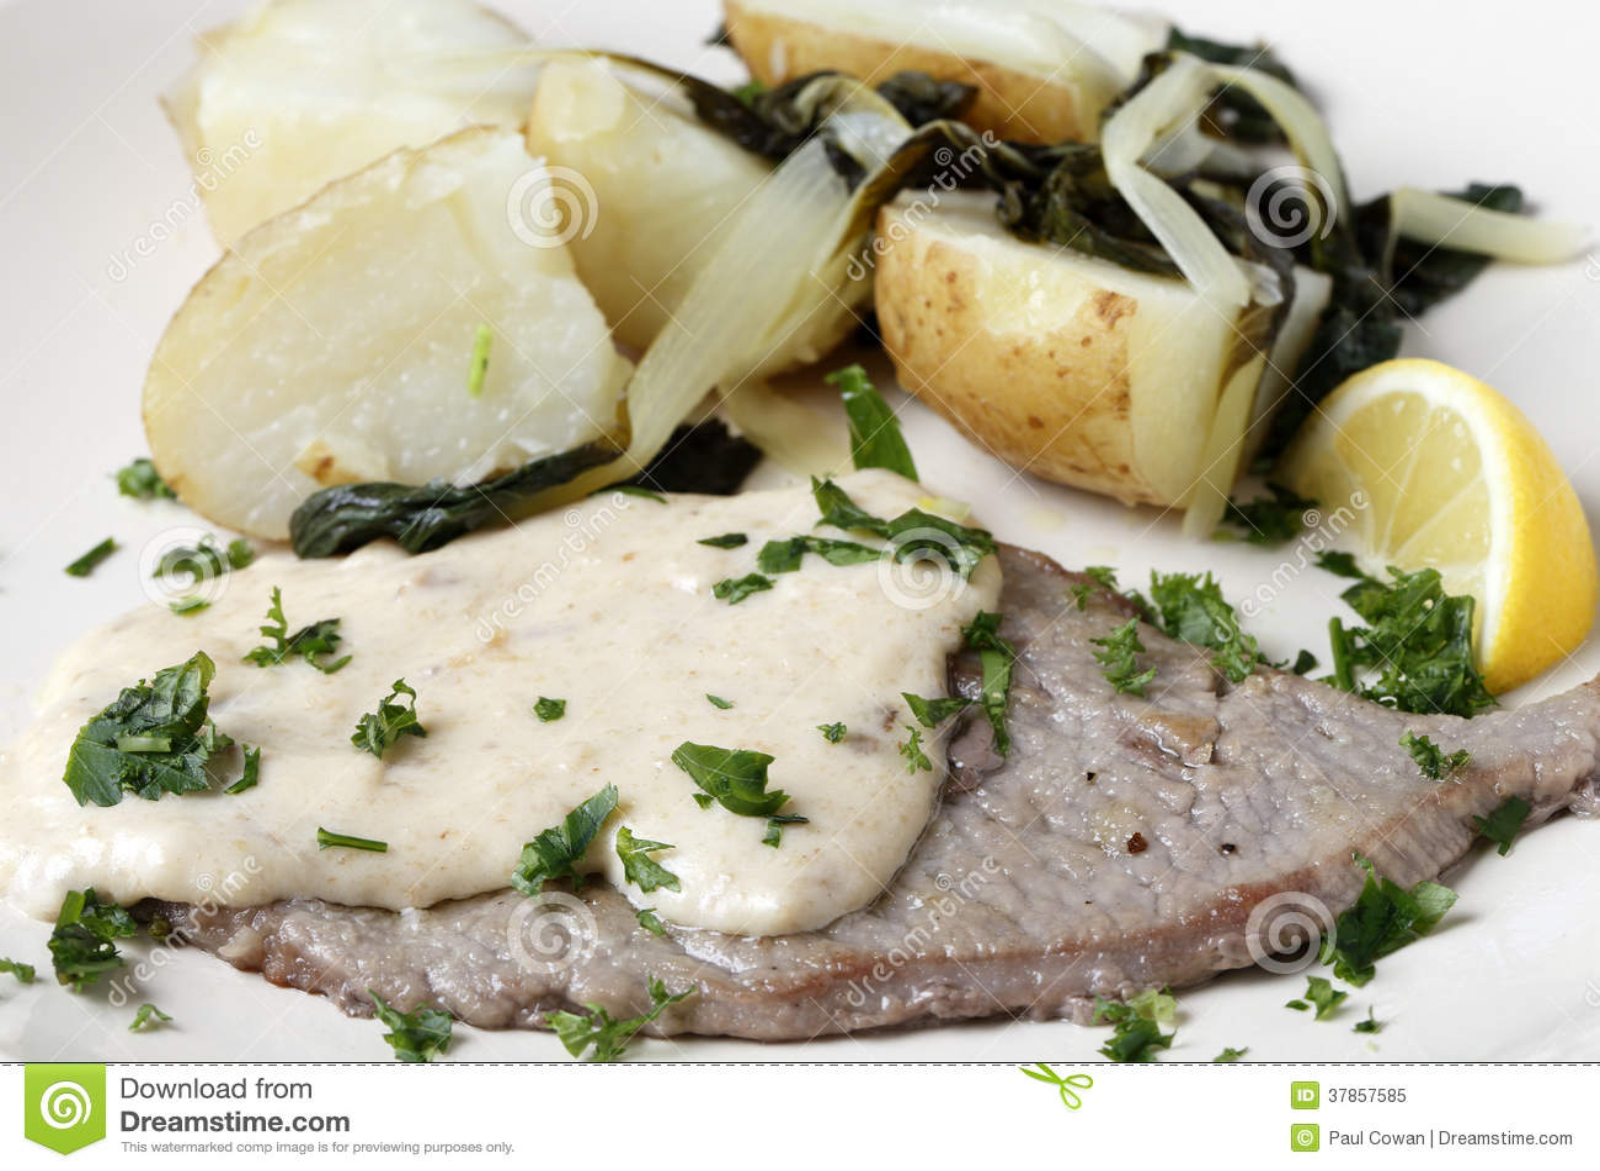 Kalfsvlees escalope met jus en aardappels